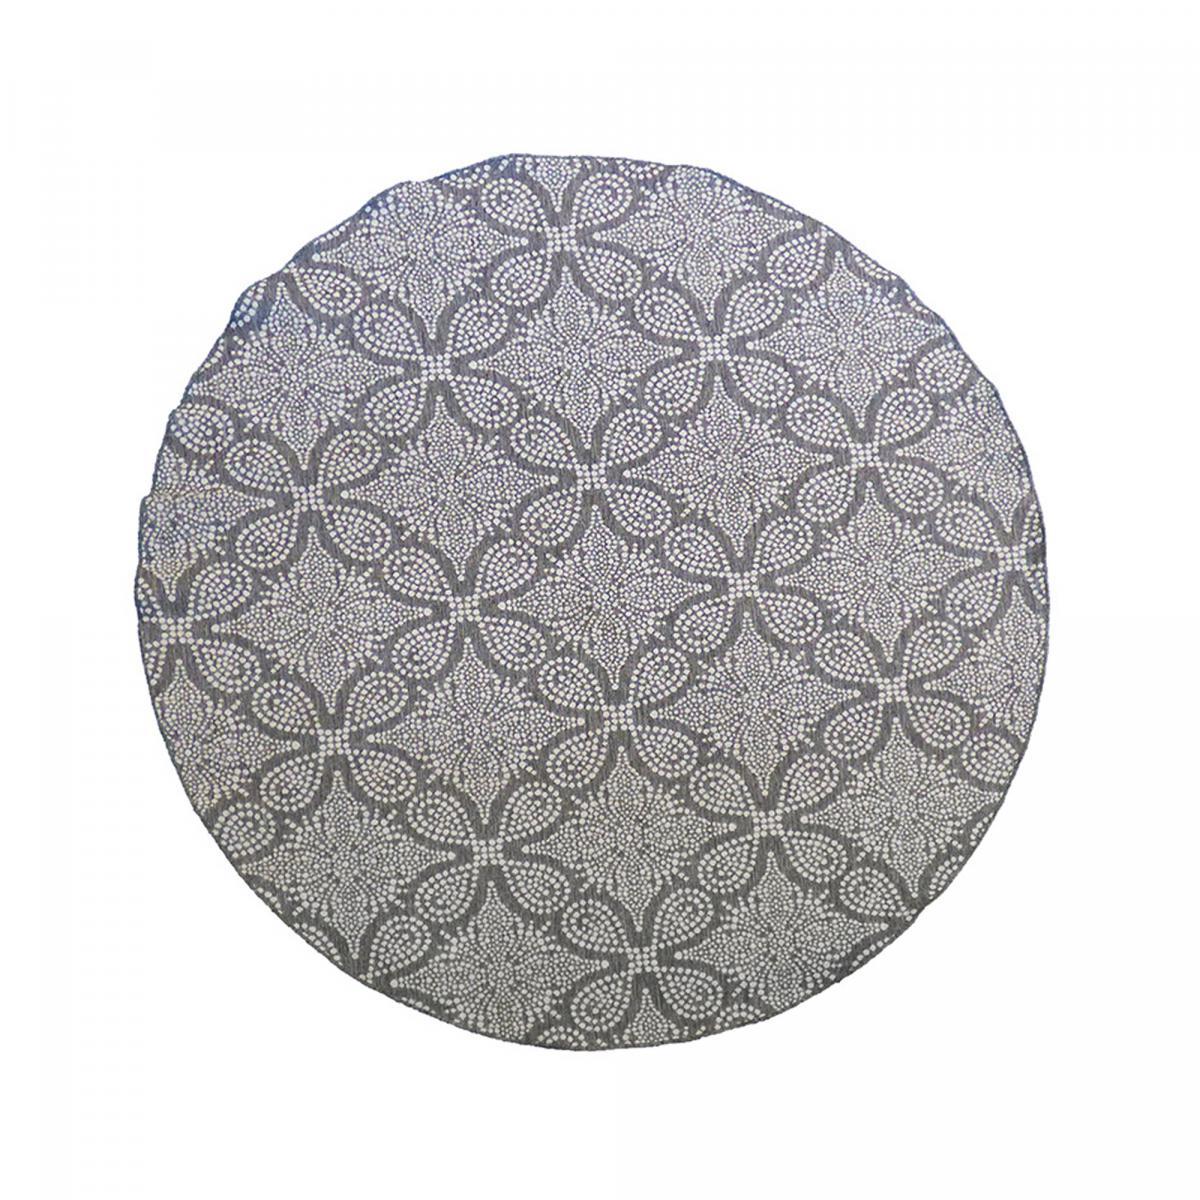 Tapis rond en polypropylène gris 160x160 rond